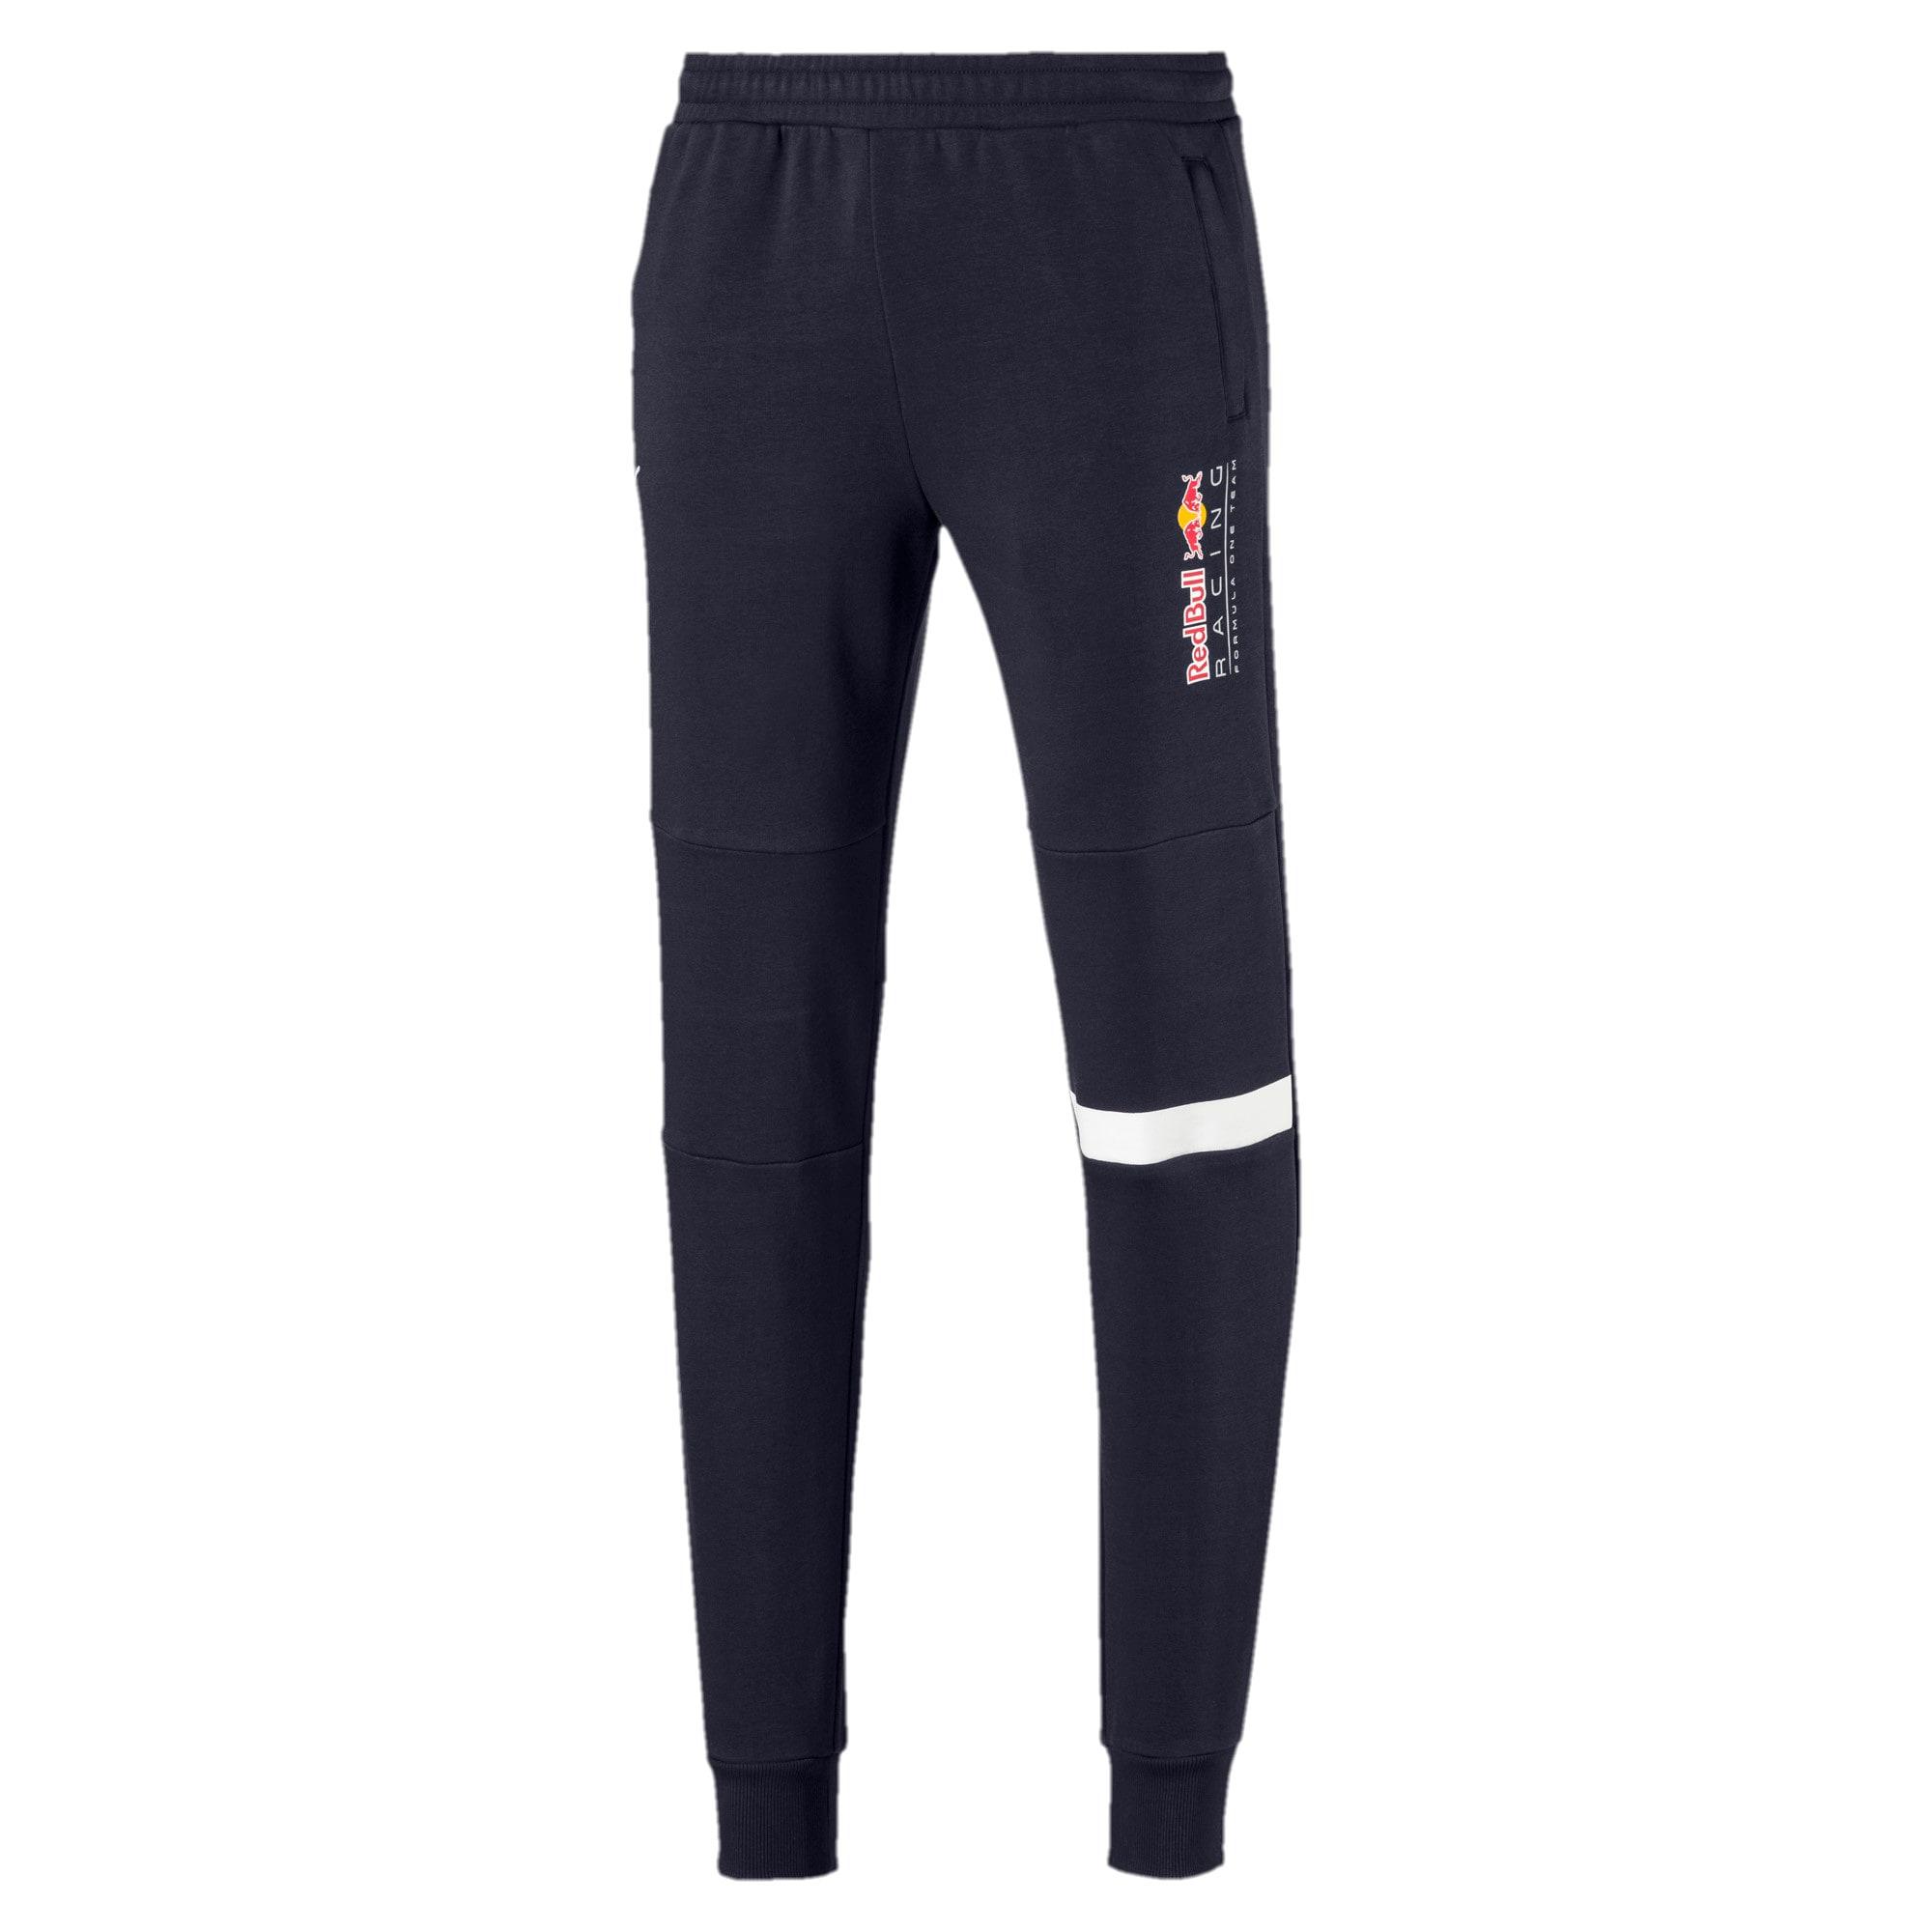 Miniatura 2 de Pantalones deportivos con logo Red Bull Racing para hombre, NIGHT SKY, mediano